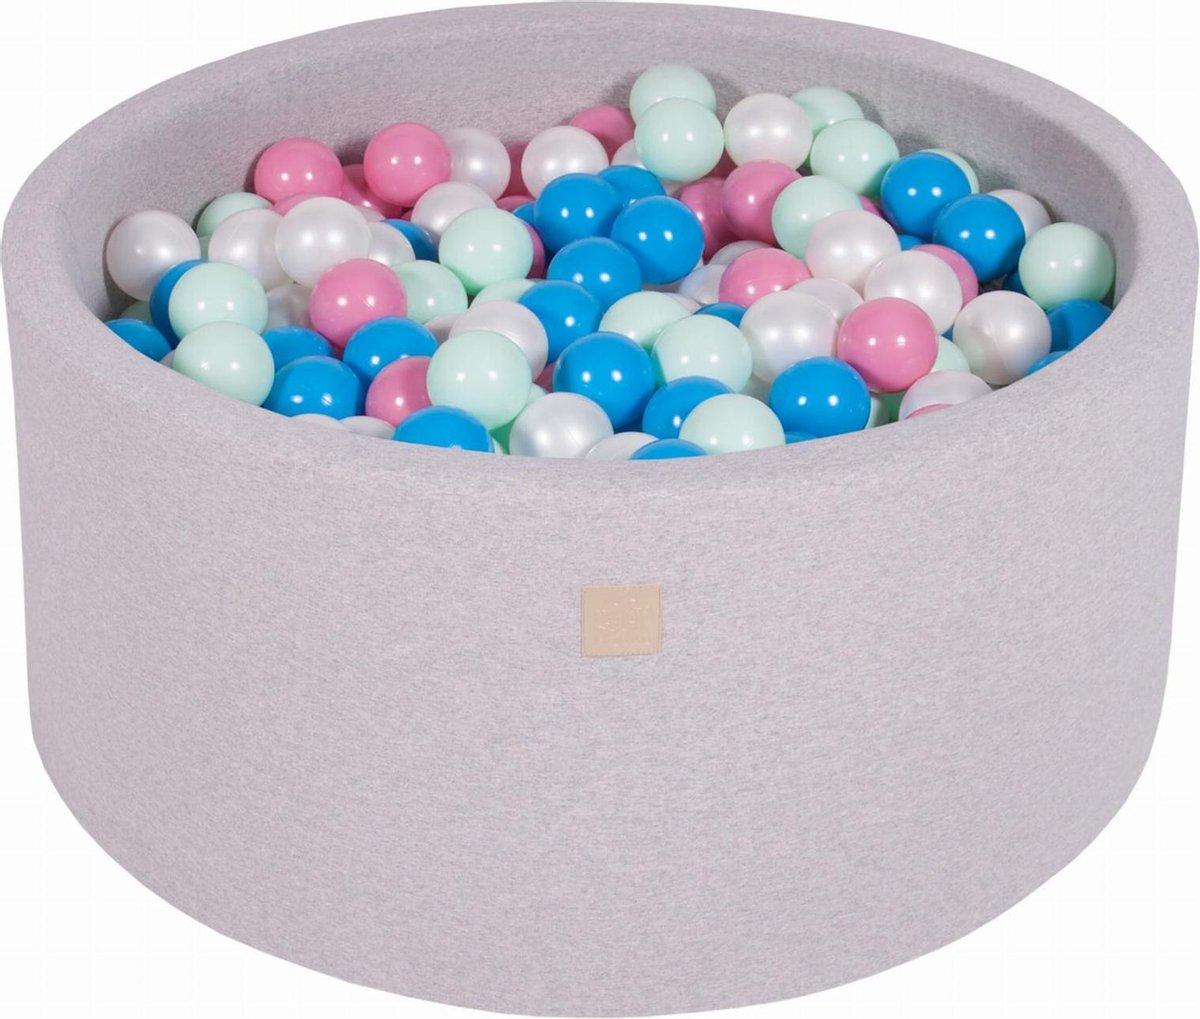 Ronde Ballenbak set incl 300 ballen 90x40cm - Licht Grijs: Blauw, Parel Wit, Licht Roze, Mint